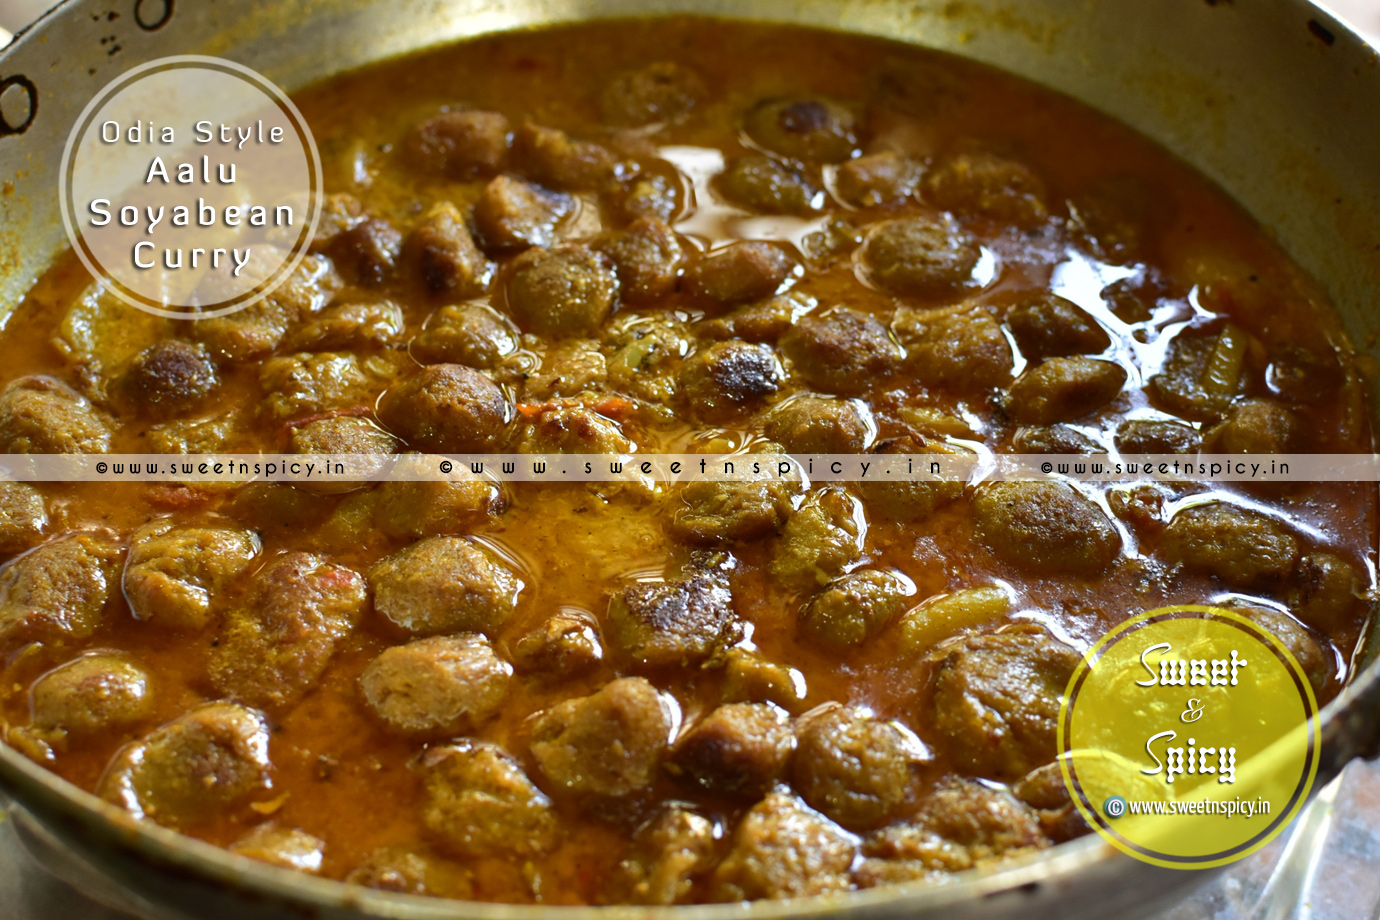 Odia Style Aalu Soyabean Curry (Mealmaker Tarkari)